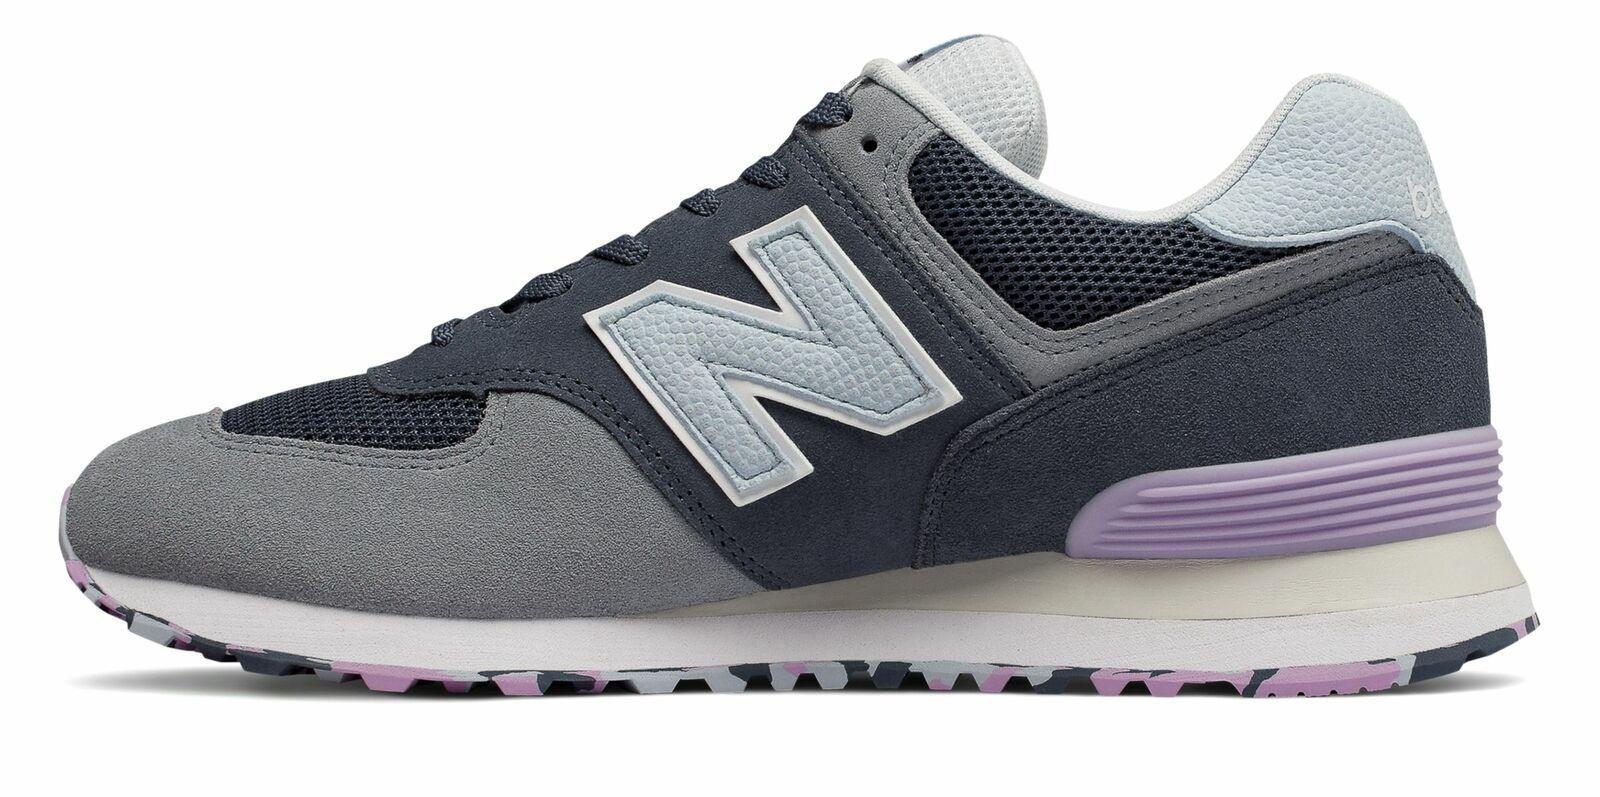 New Balance 574 Men/'s Sneakers Training Running Gym Casual Sport Shoes NIB